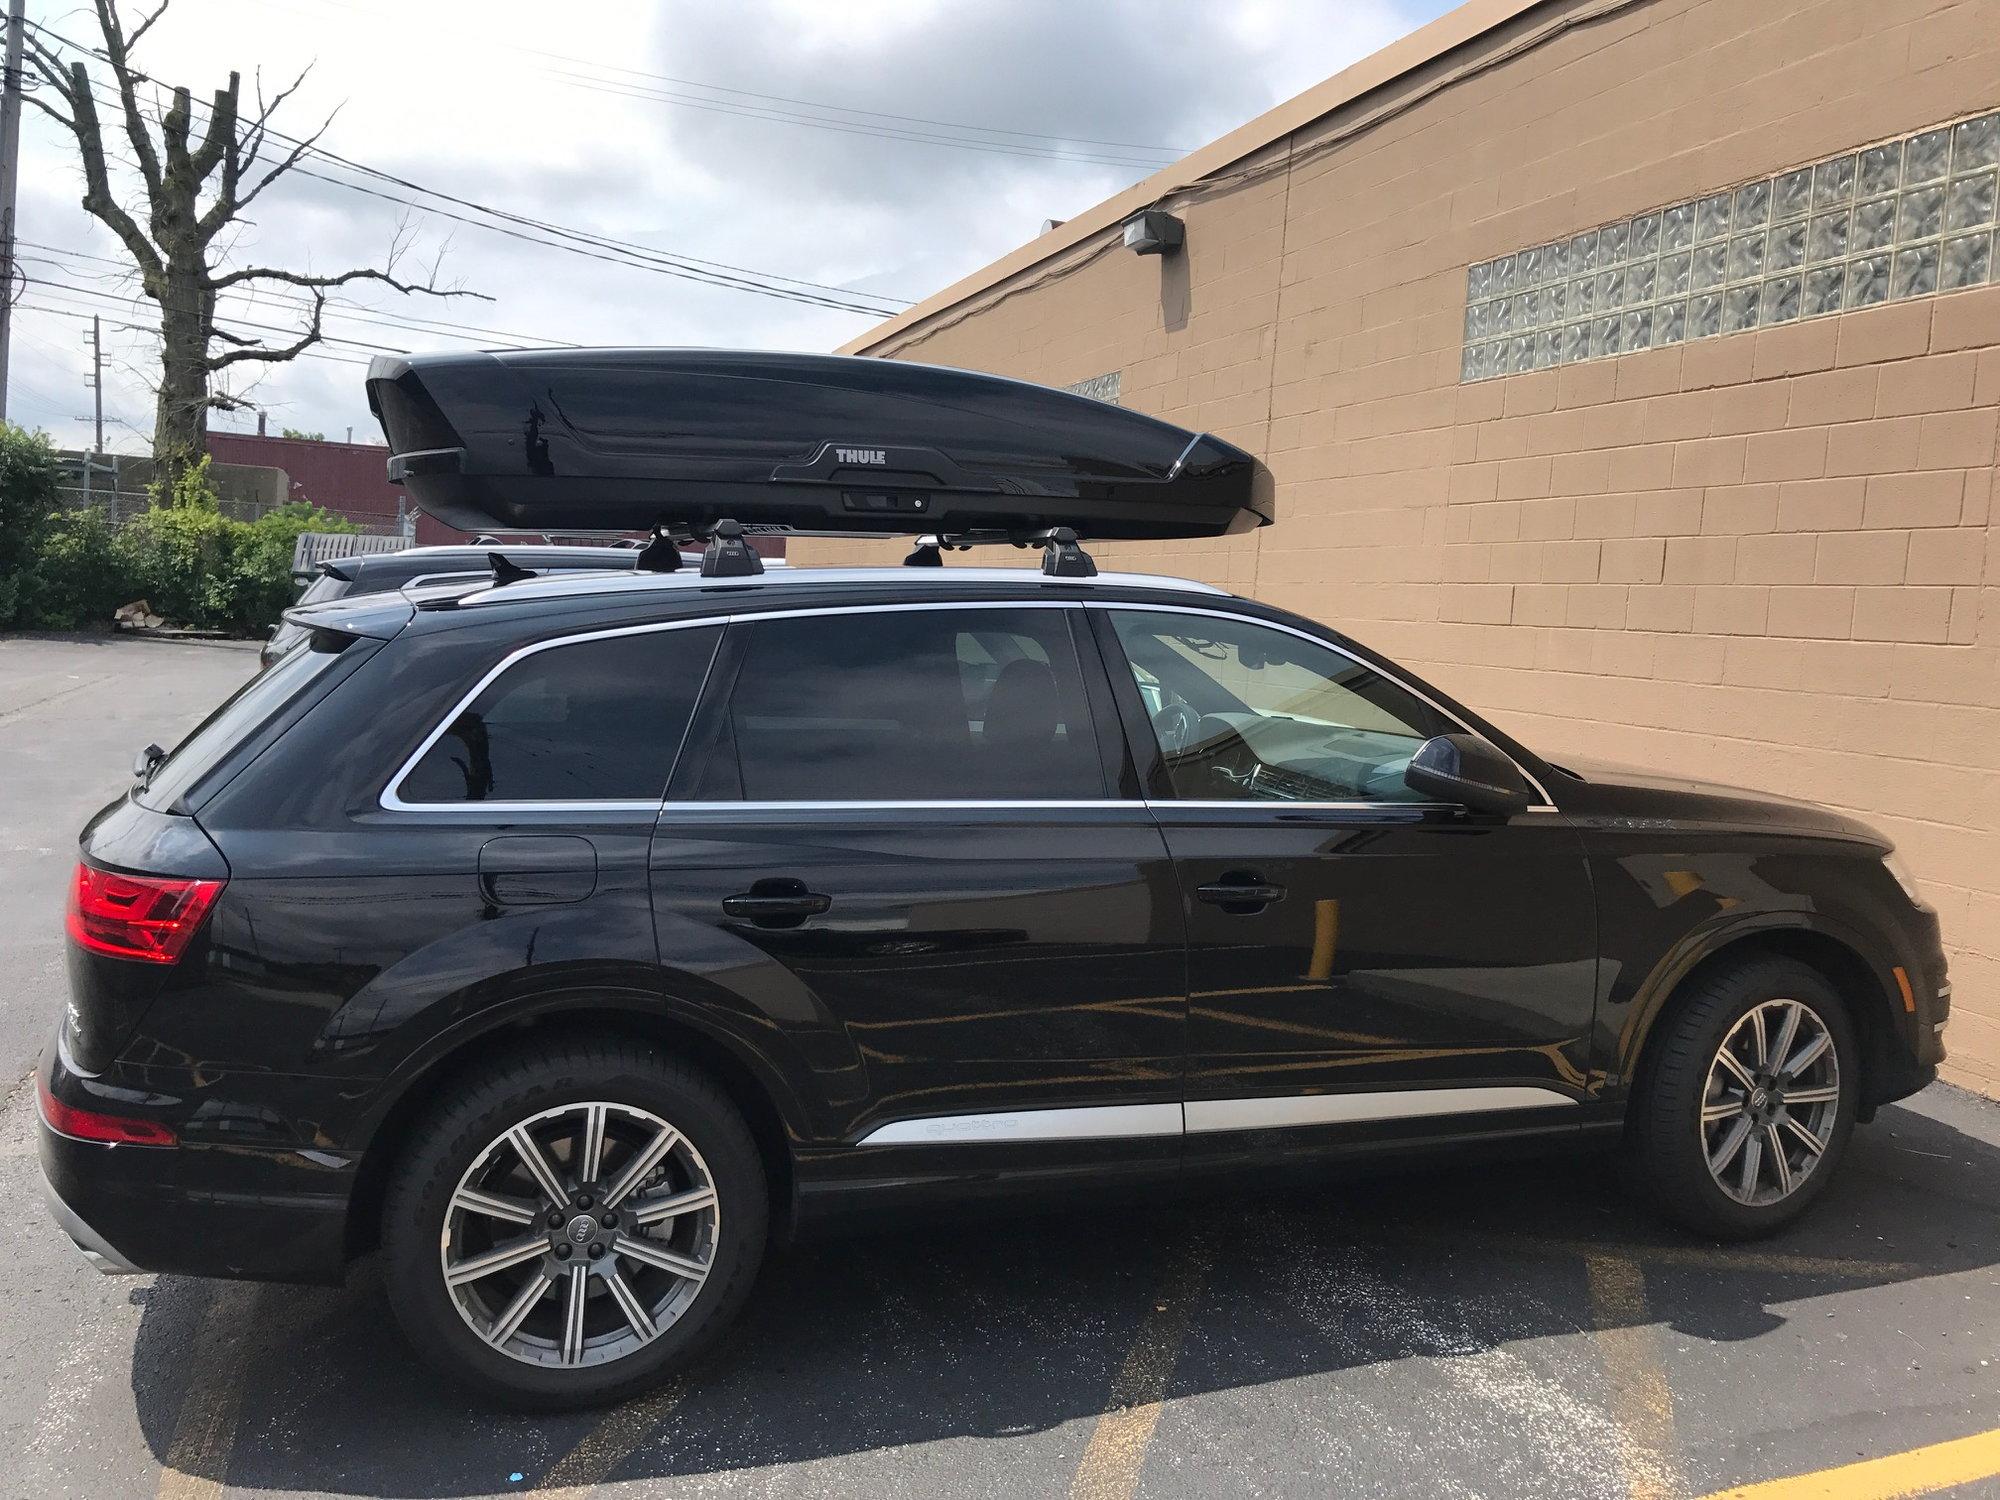 Audi Roof Rack Thule Motion Xt Xxl Box Stowaway Max